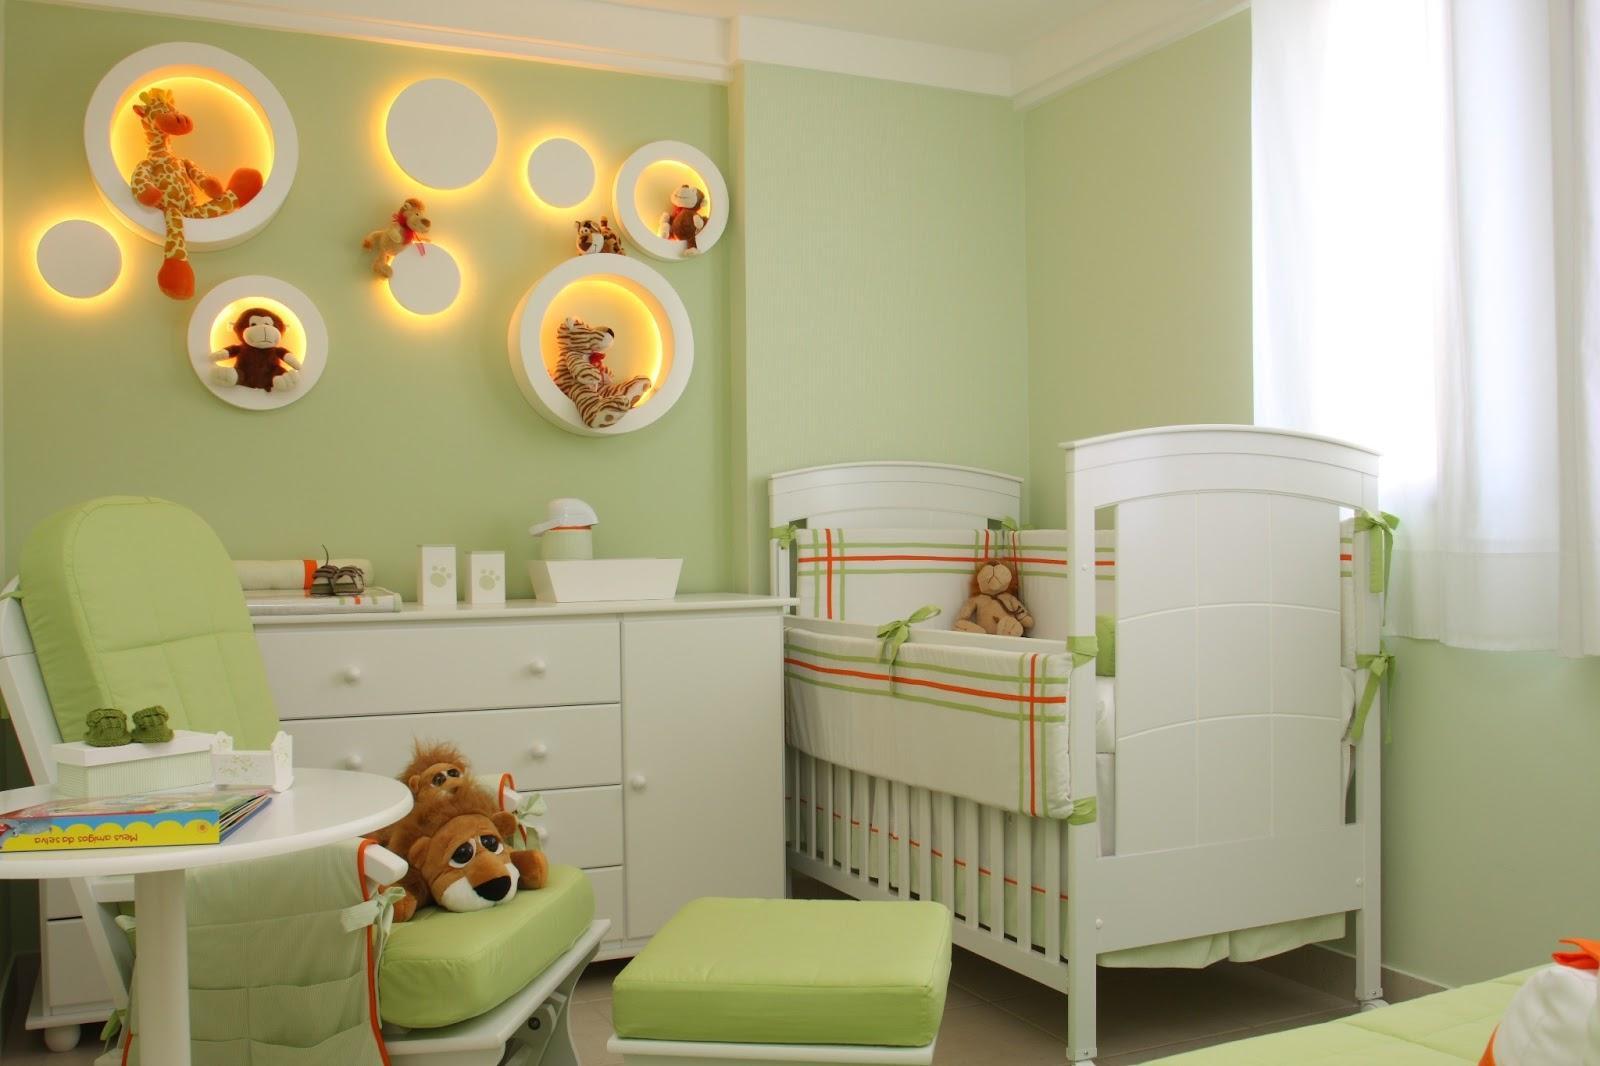 60 quartos de beb s verdes decorados fotos lindas - Paredes en verde ...